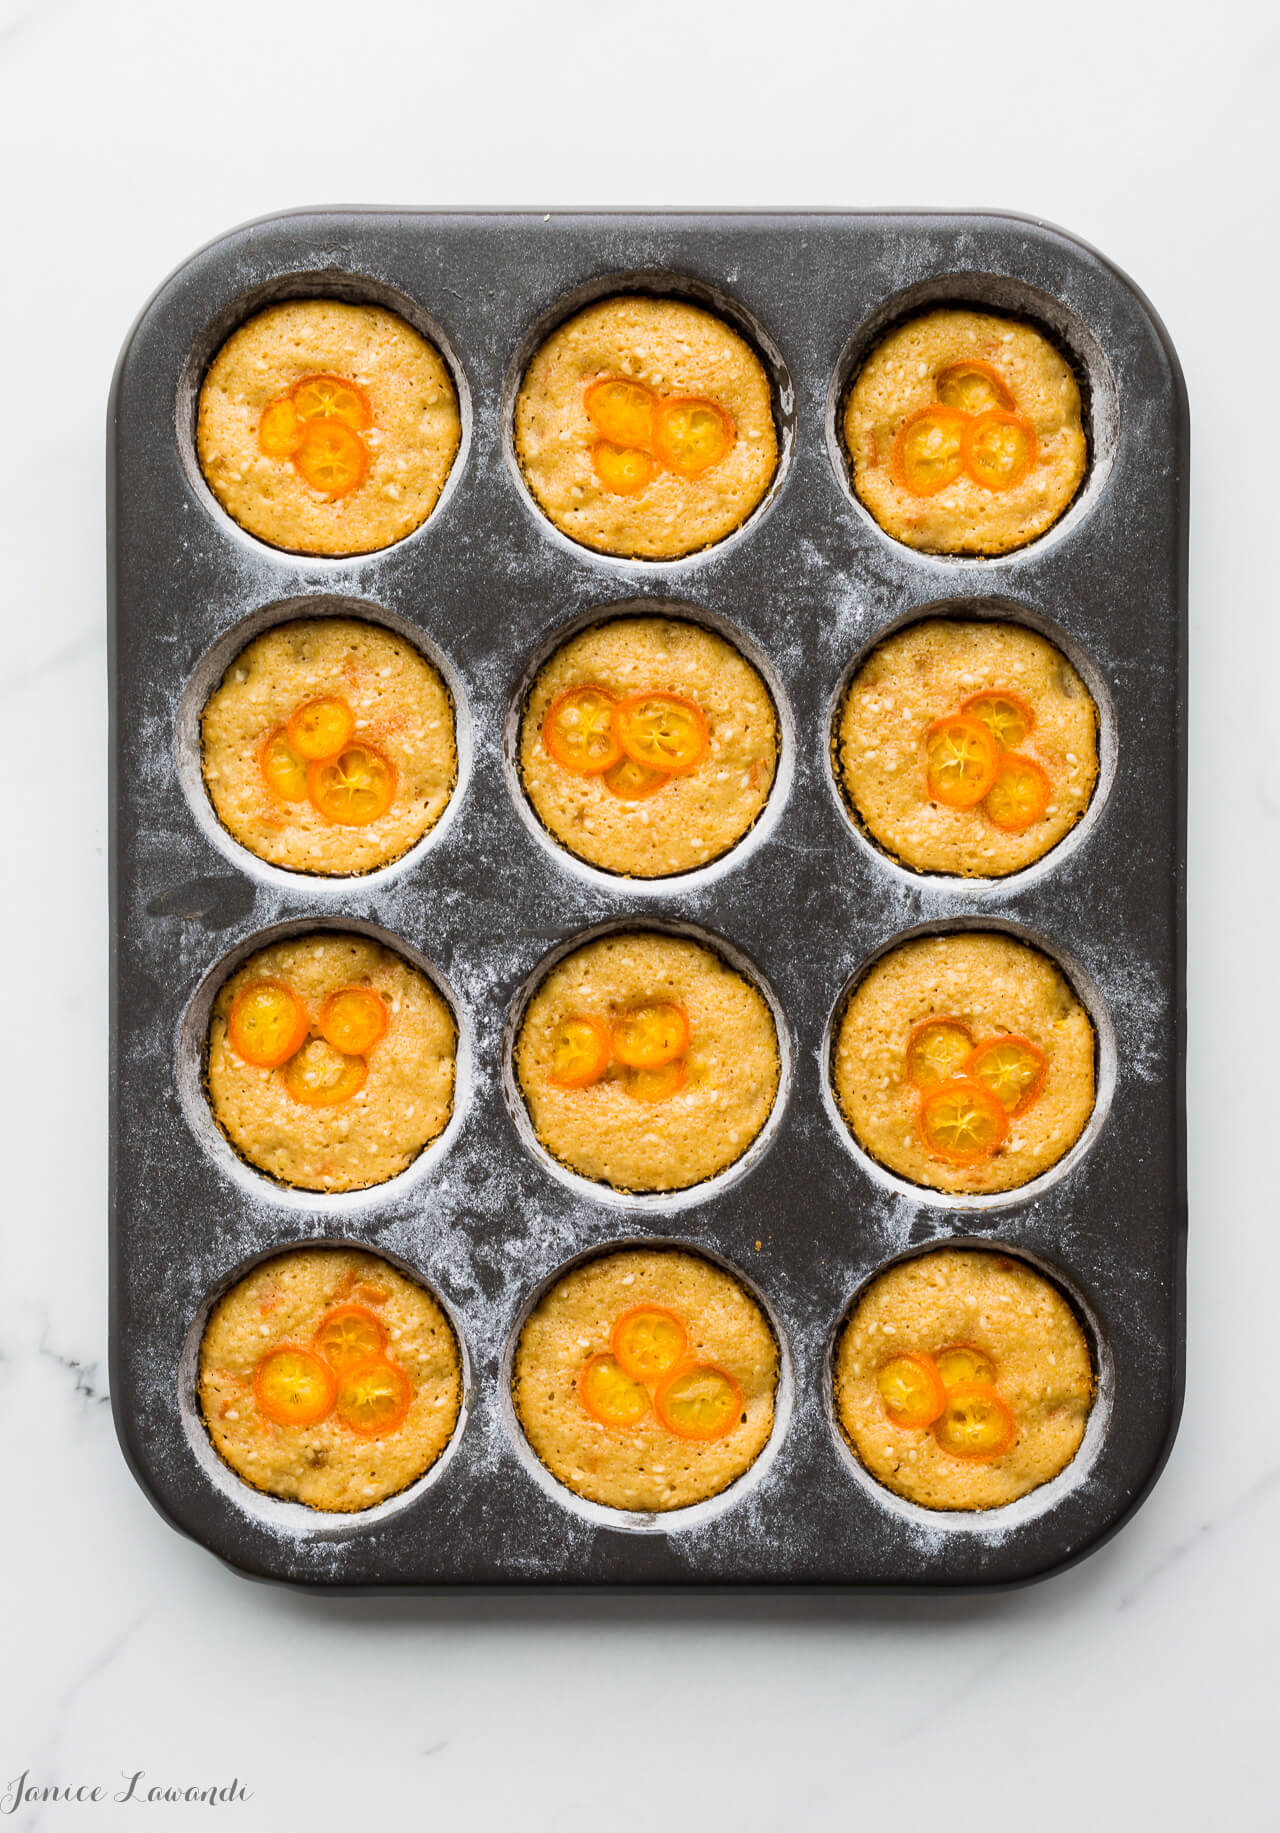 Sesame kumquat financiers